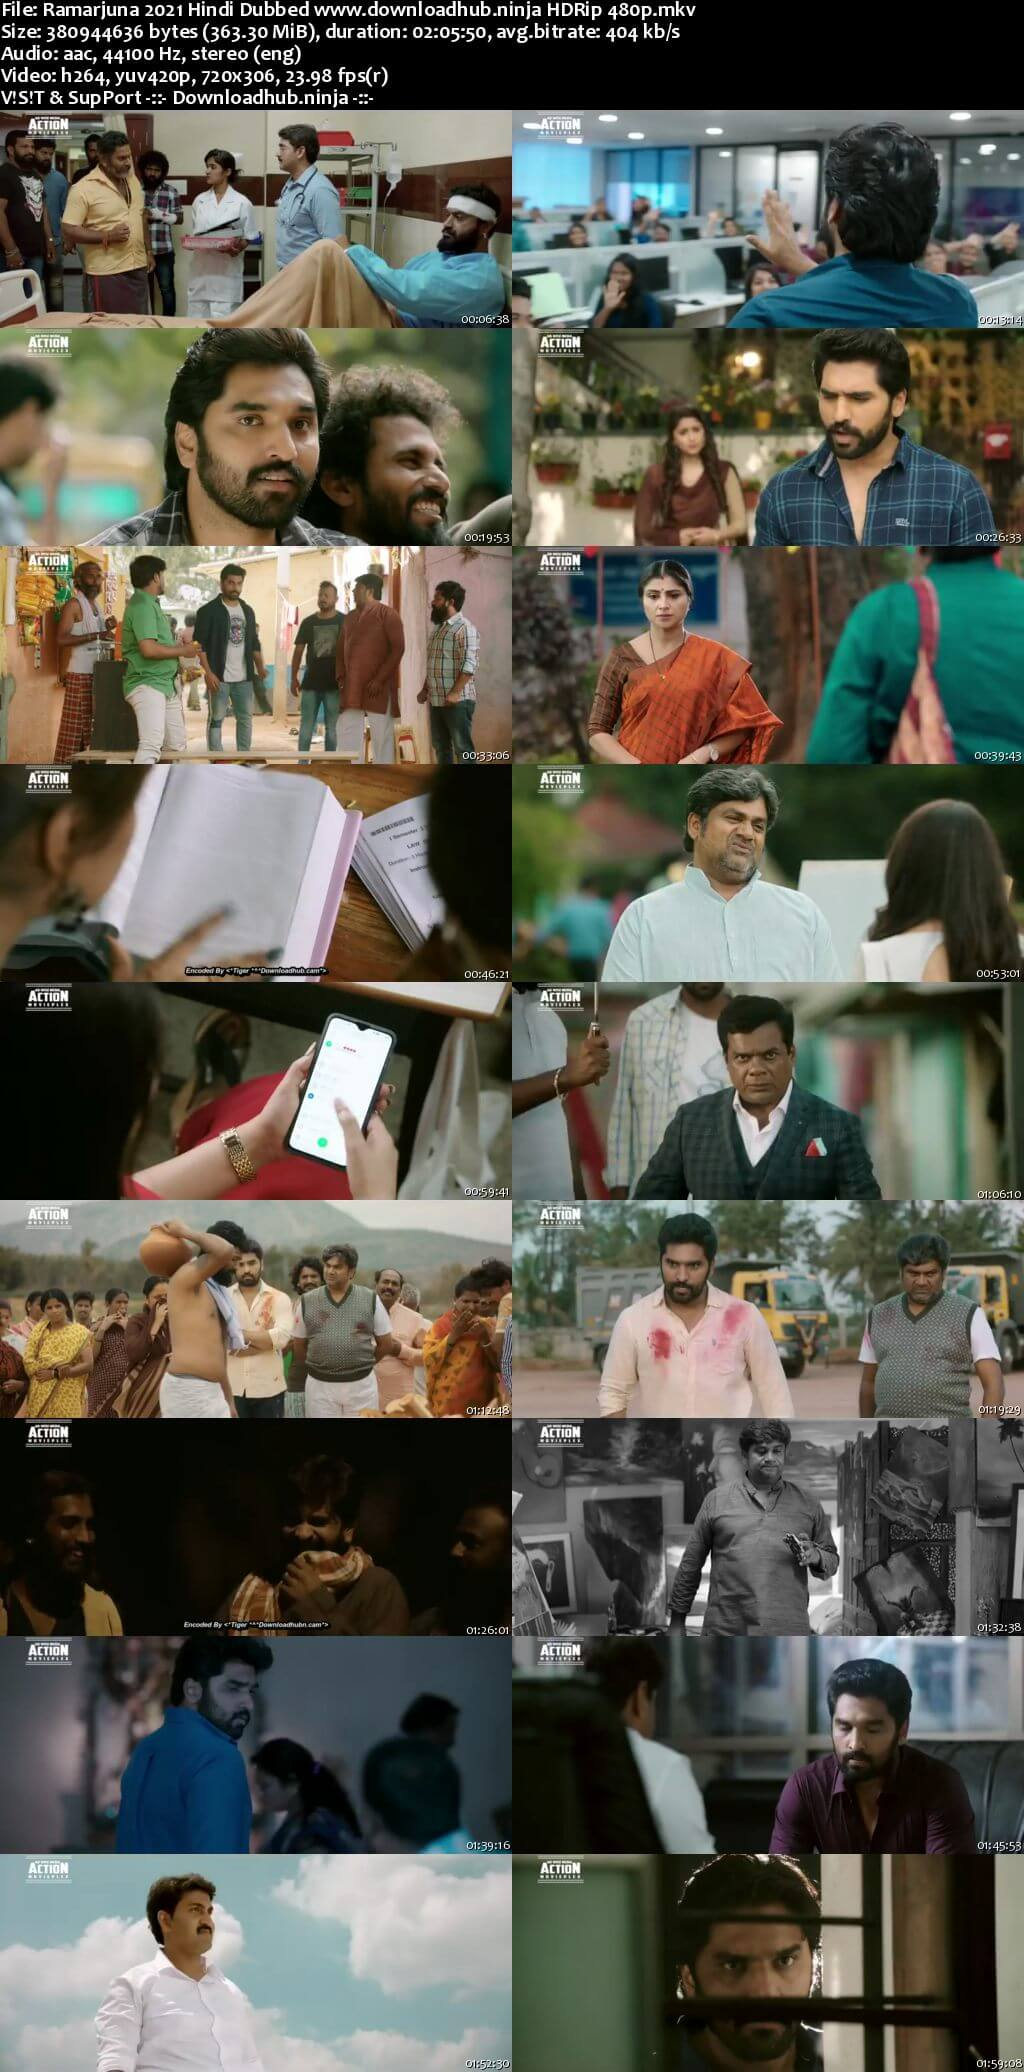 Ramarjuna 2021 Hindi Dubbed 350MB HDRip 480p